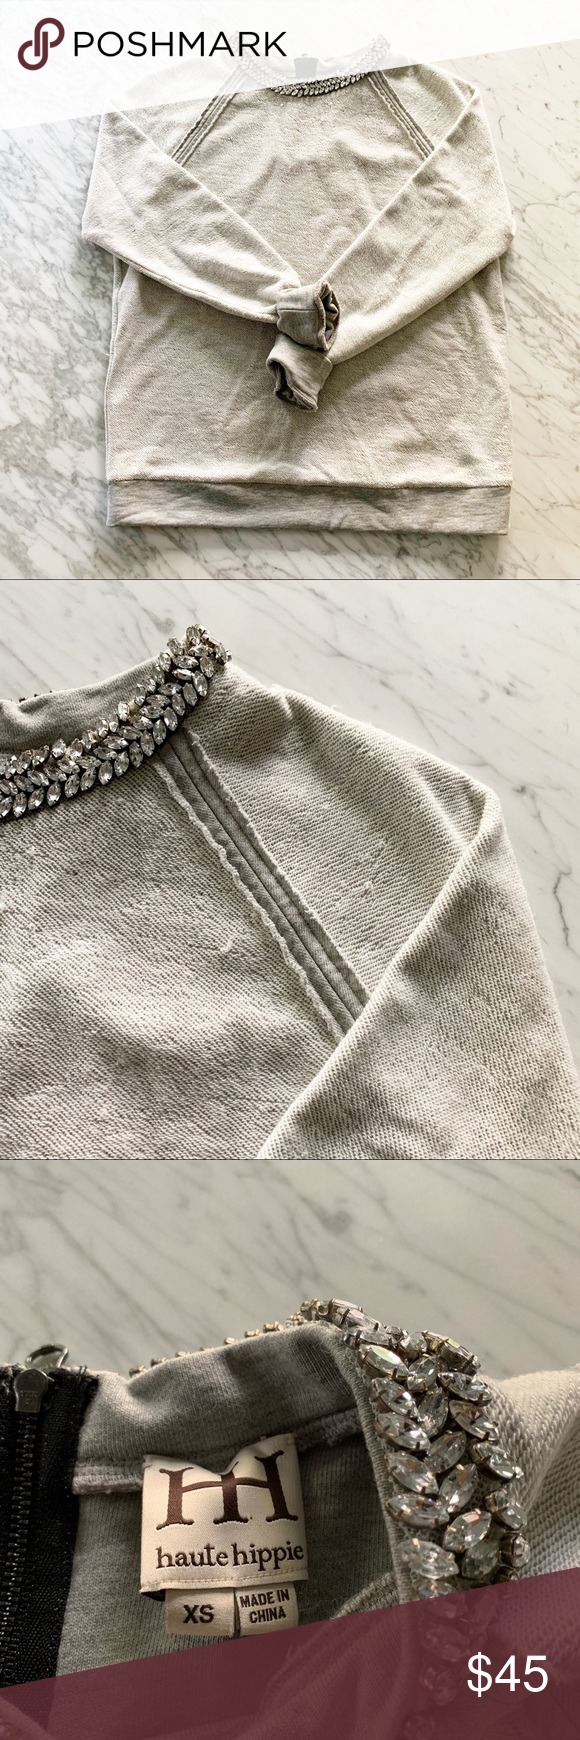 18837ee56acc3b Haute Hippie Jeweled Collar Sweatshirt